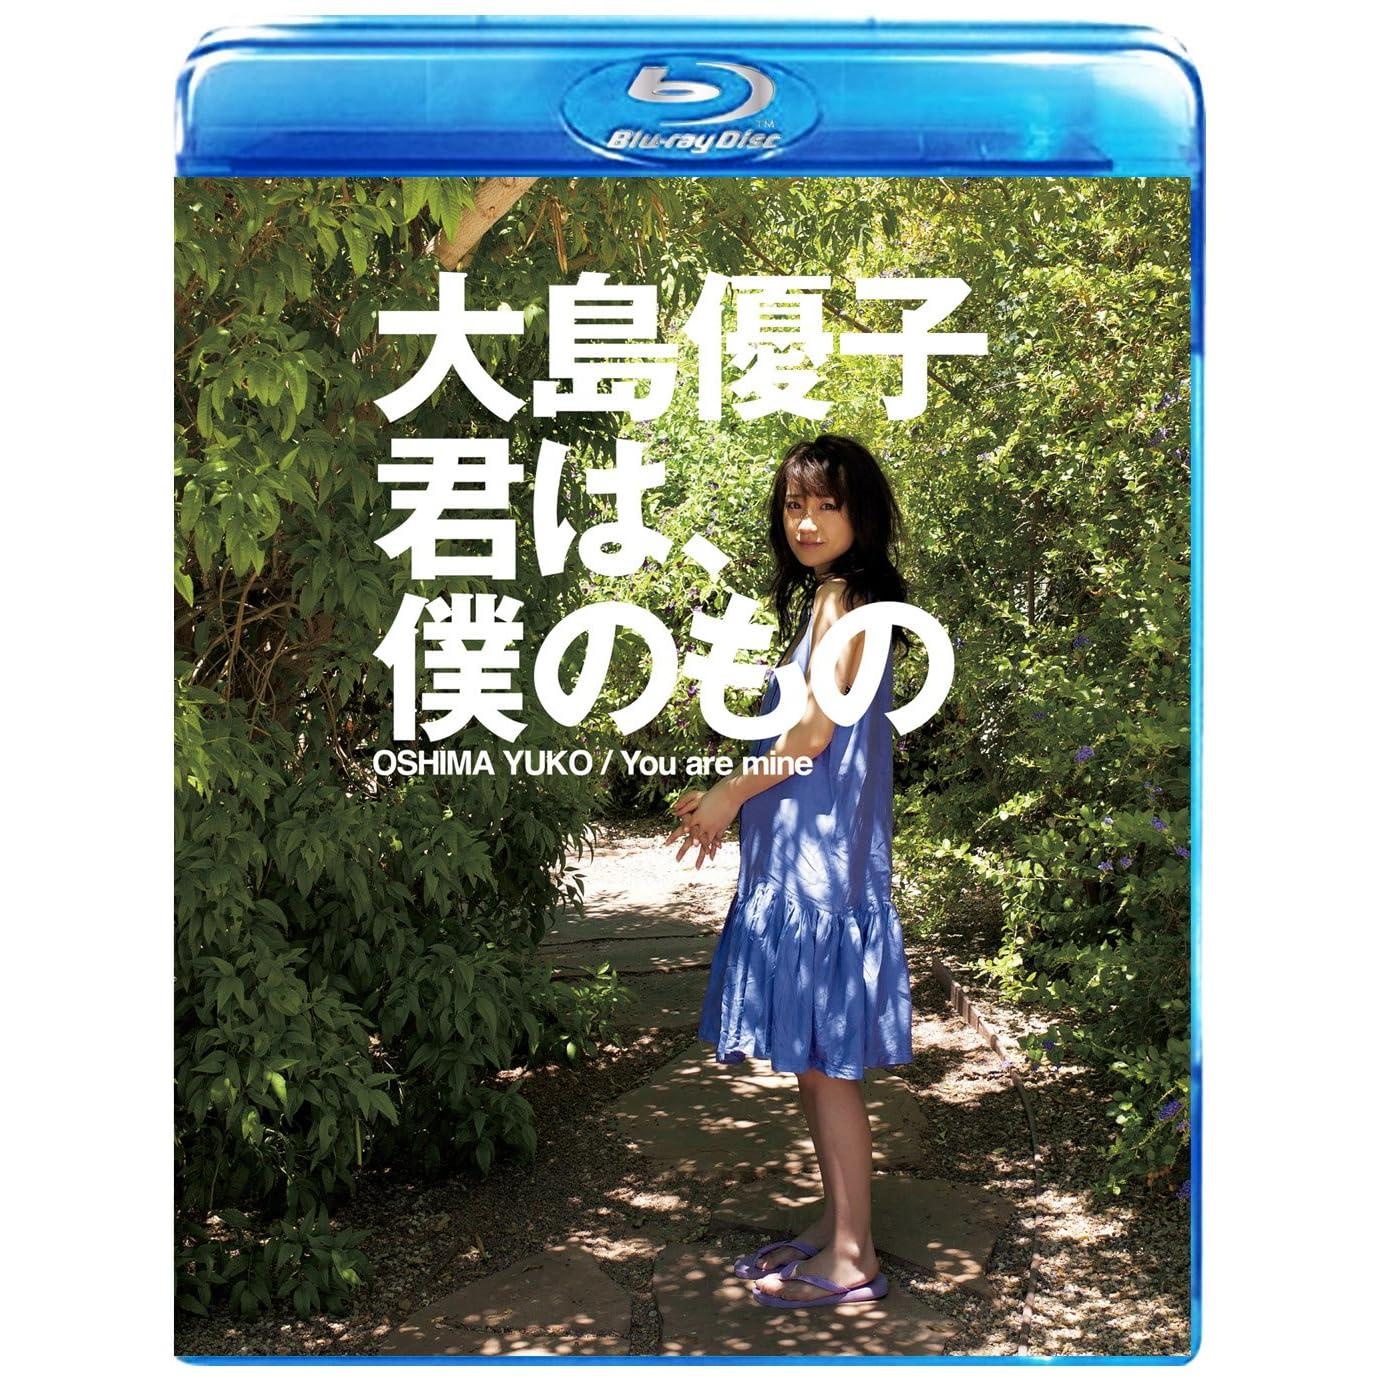 [BDRIP][大島優子][Album][1st][君は、僕のもの][AVC-1080P][4.8GB 百度 ...